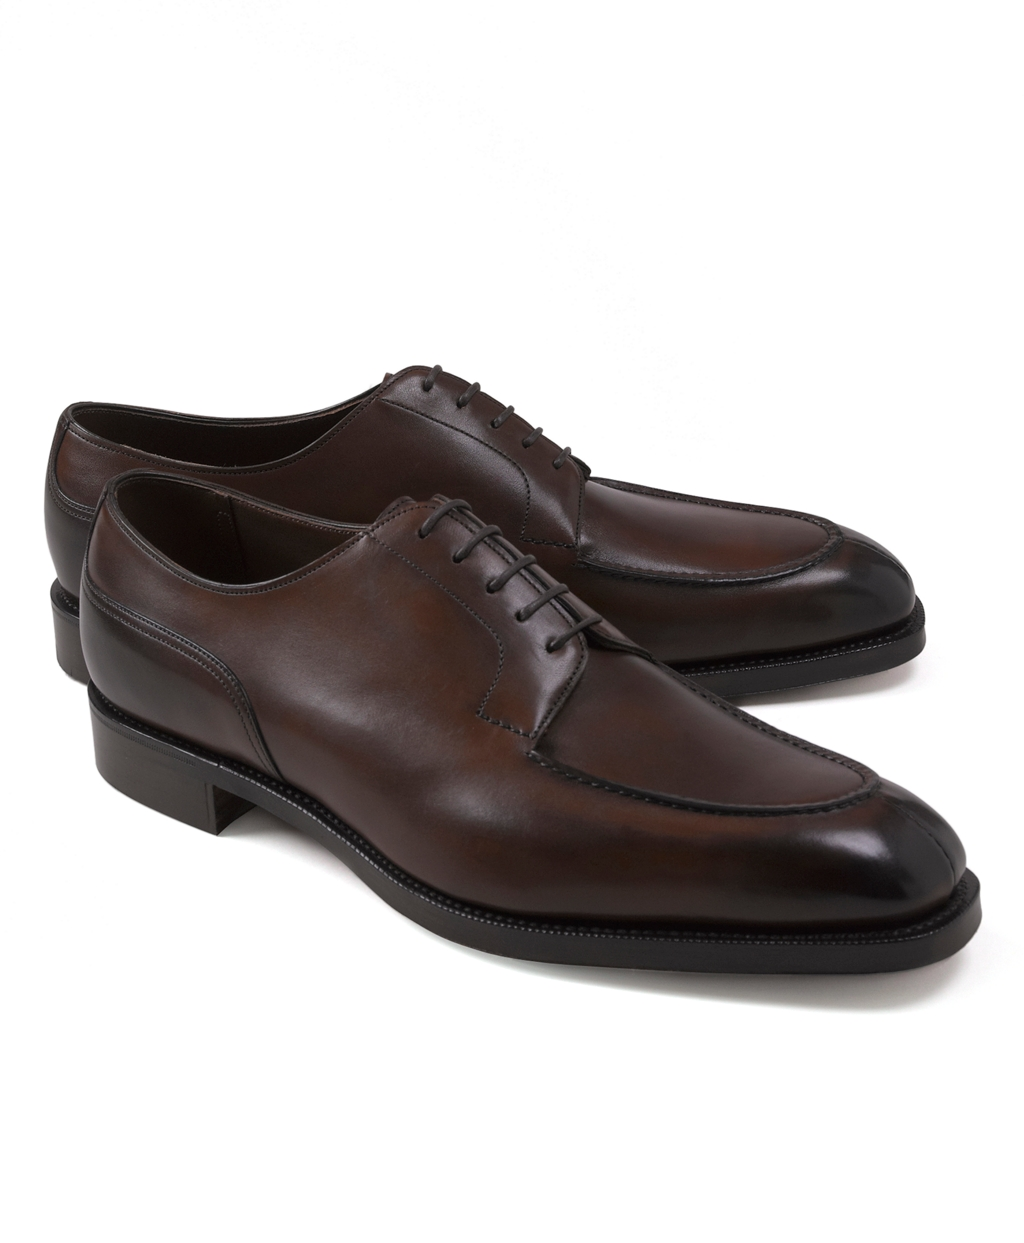 Edward Green Shoes Sale